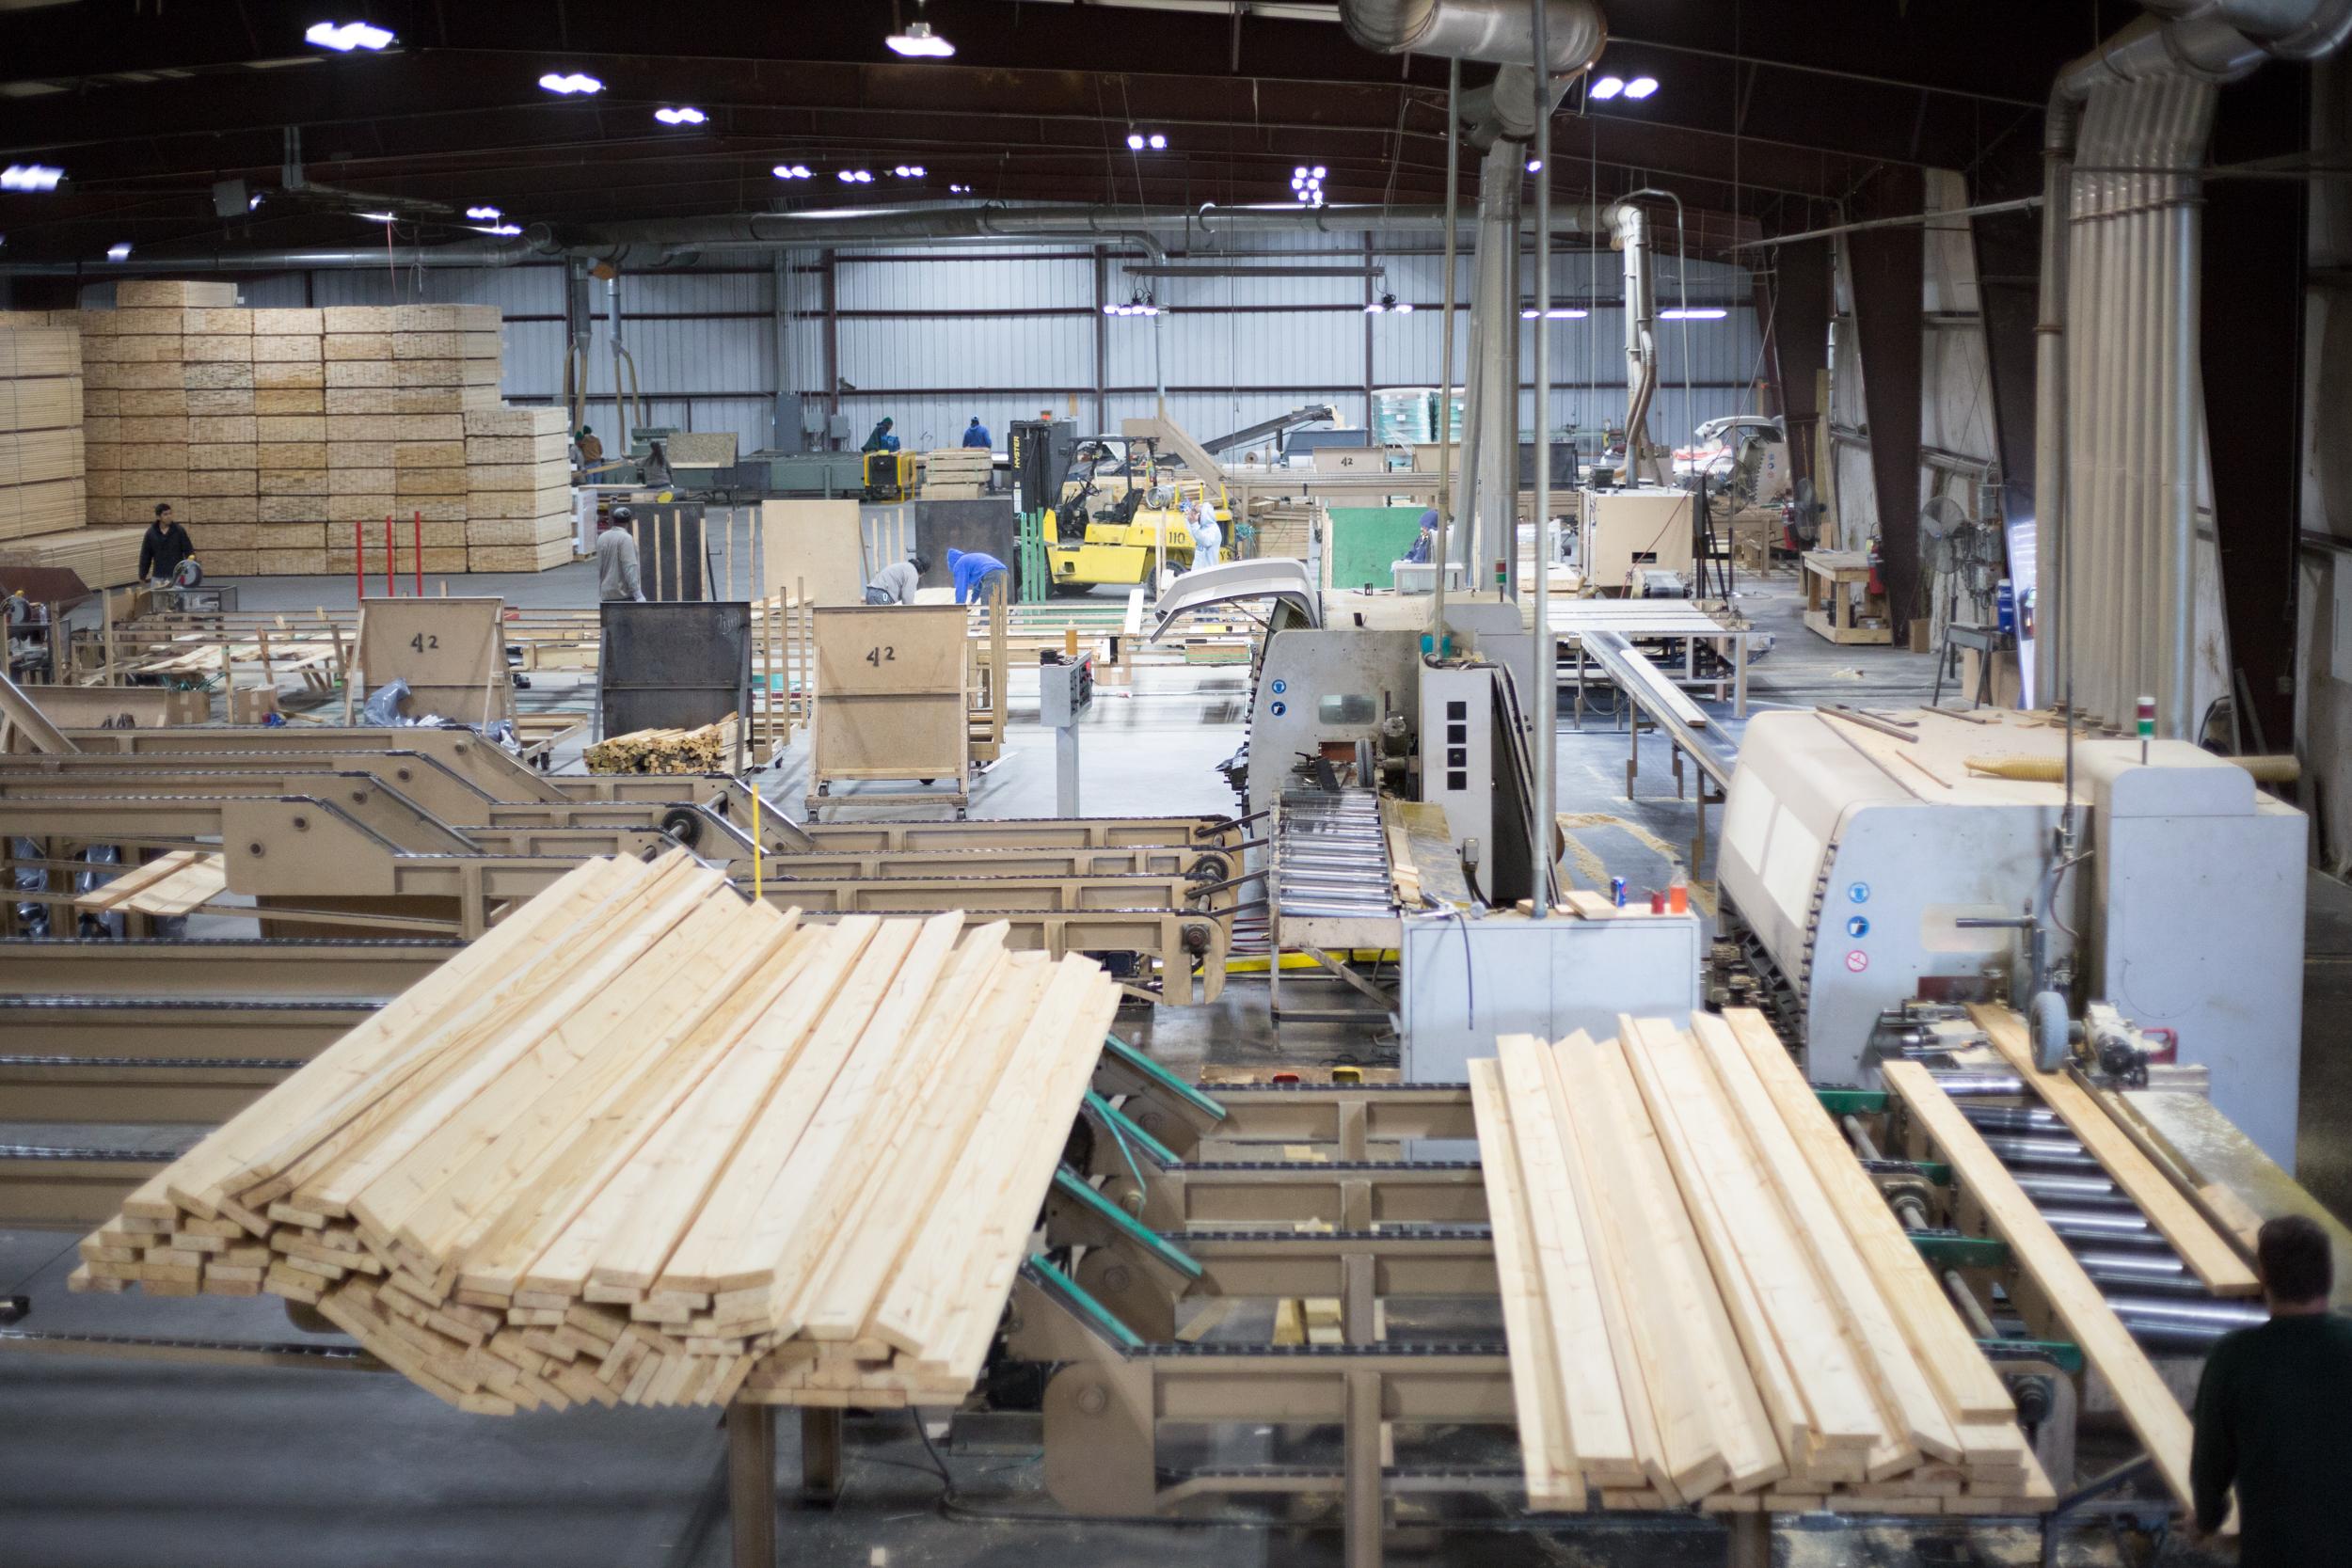 east coast lumber yard Kisley-24.jpg